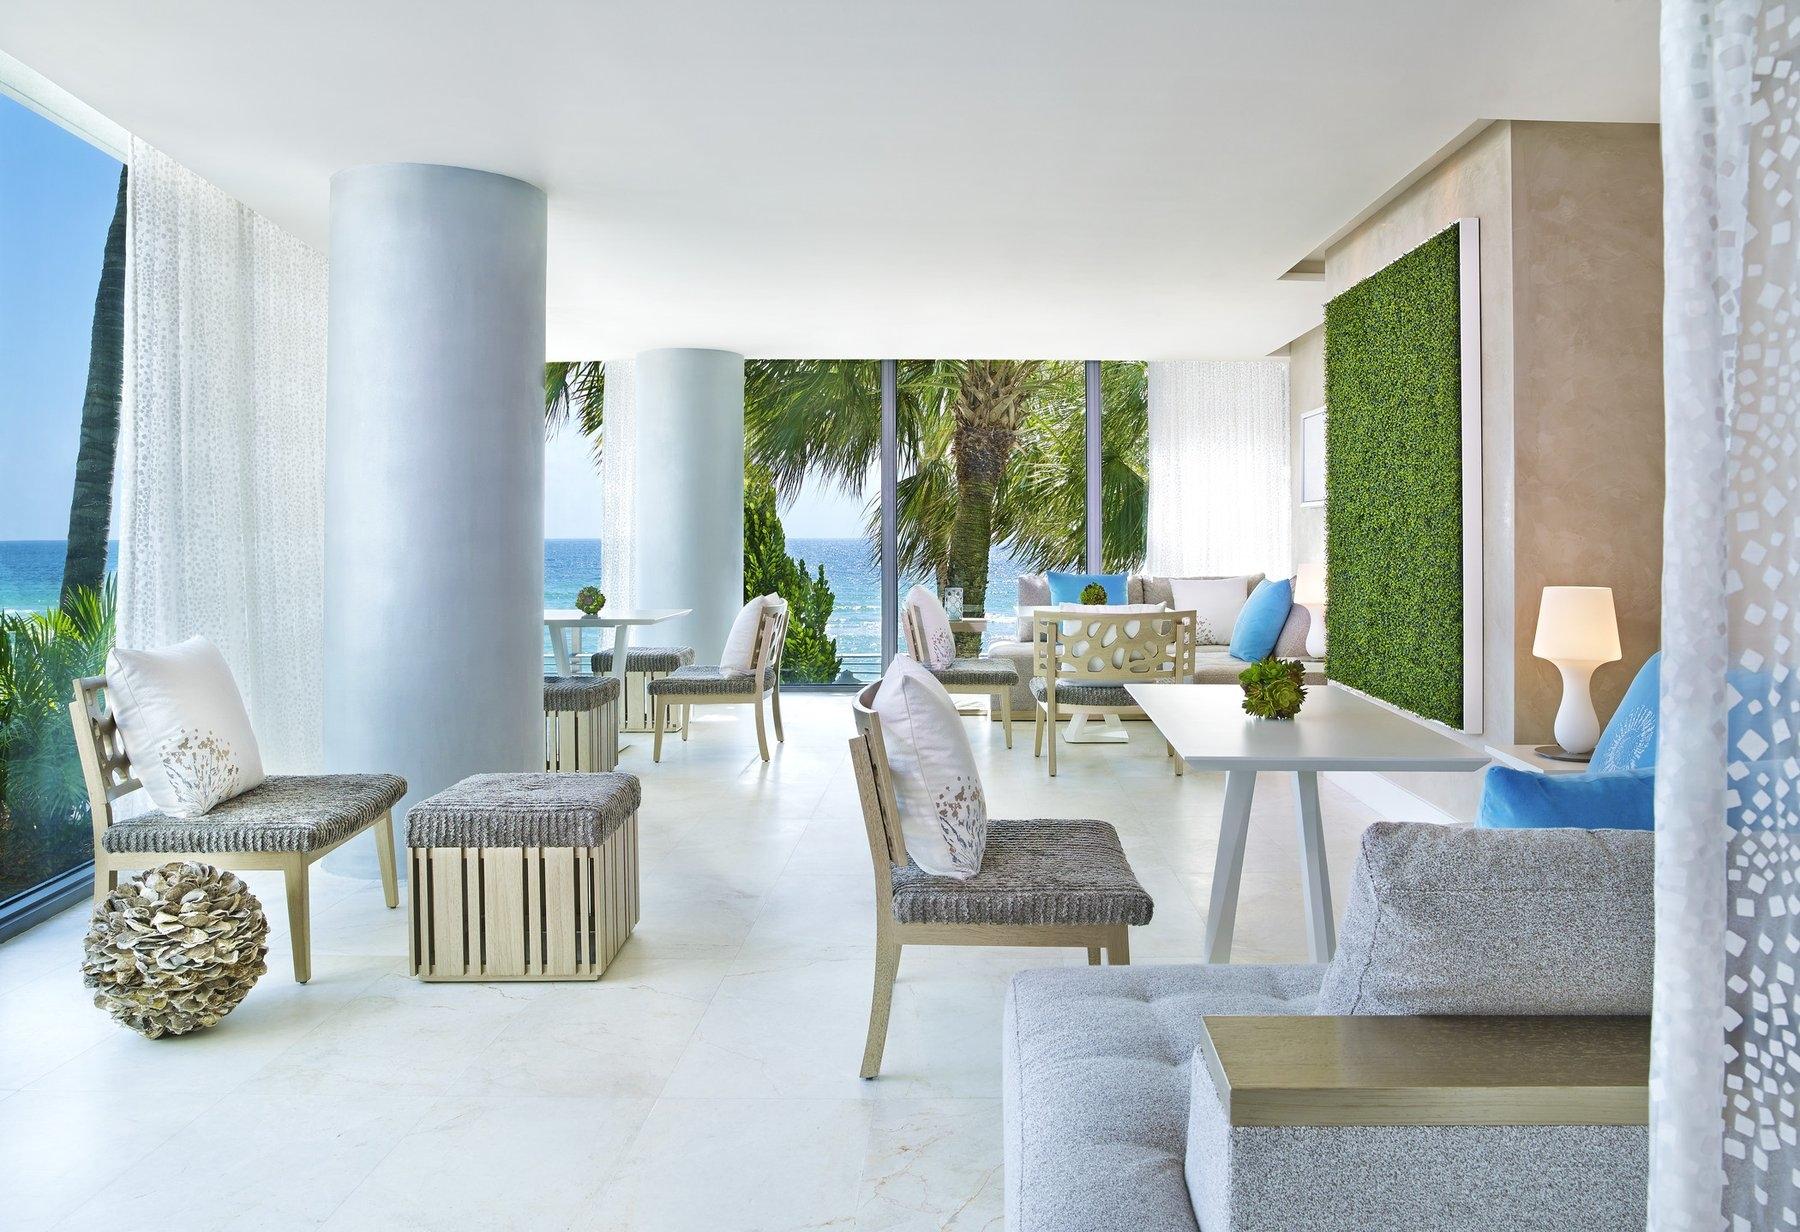 Spa Cafe - The Diplomat Beach Resort, Miami, FL